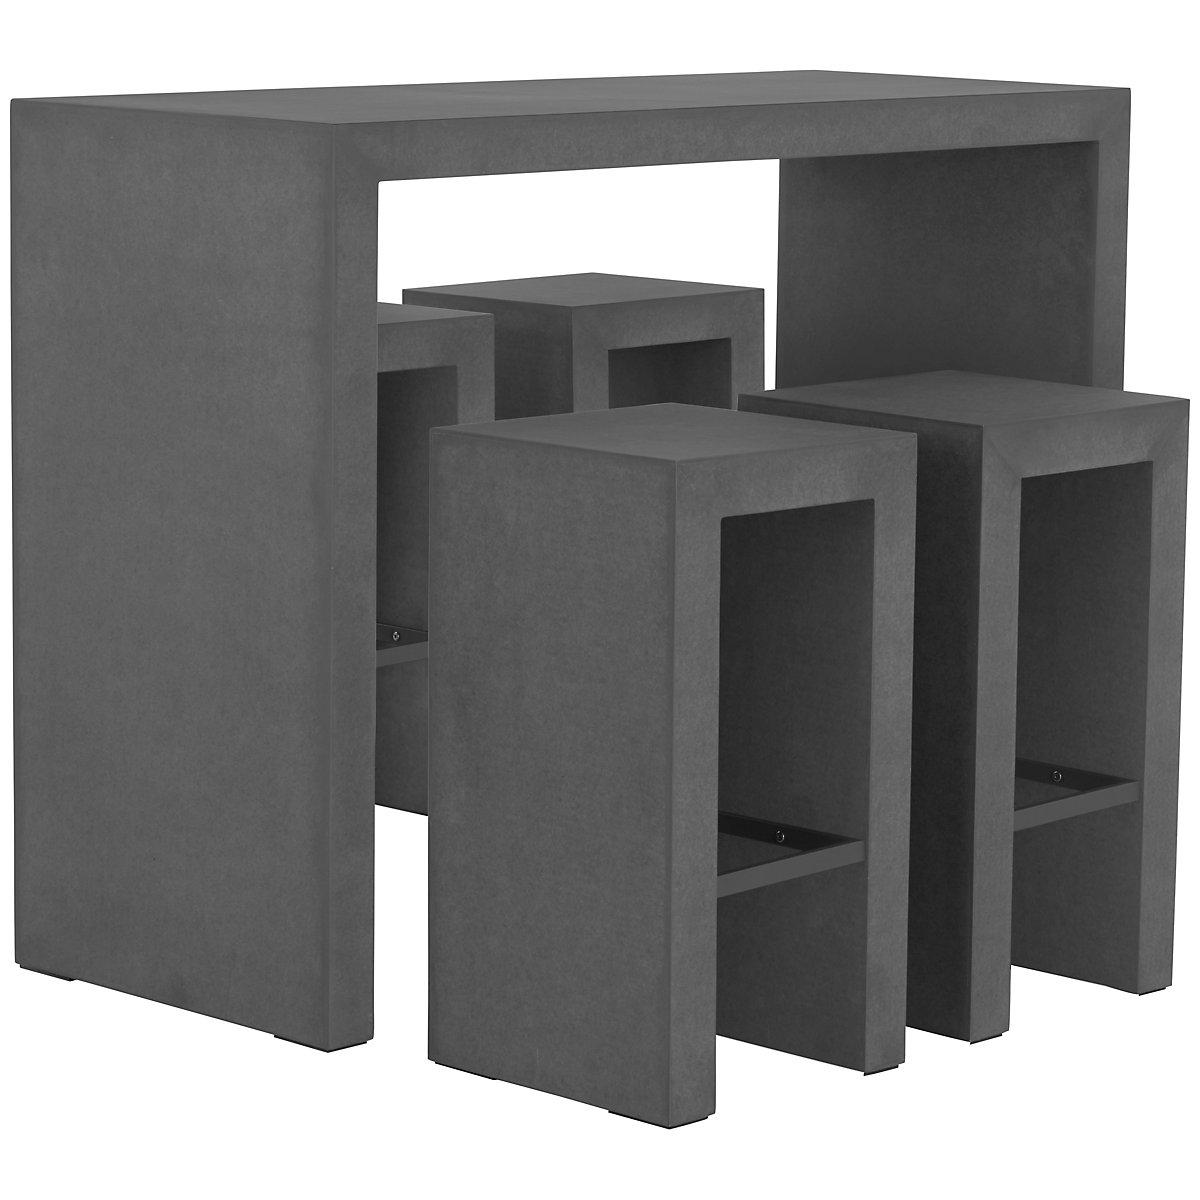 Sydney Concrete Concrete High Table & 4 Barstools